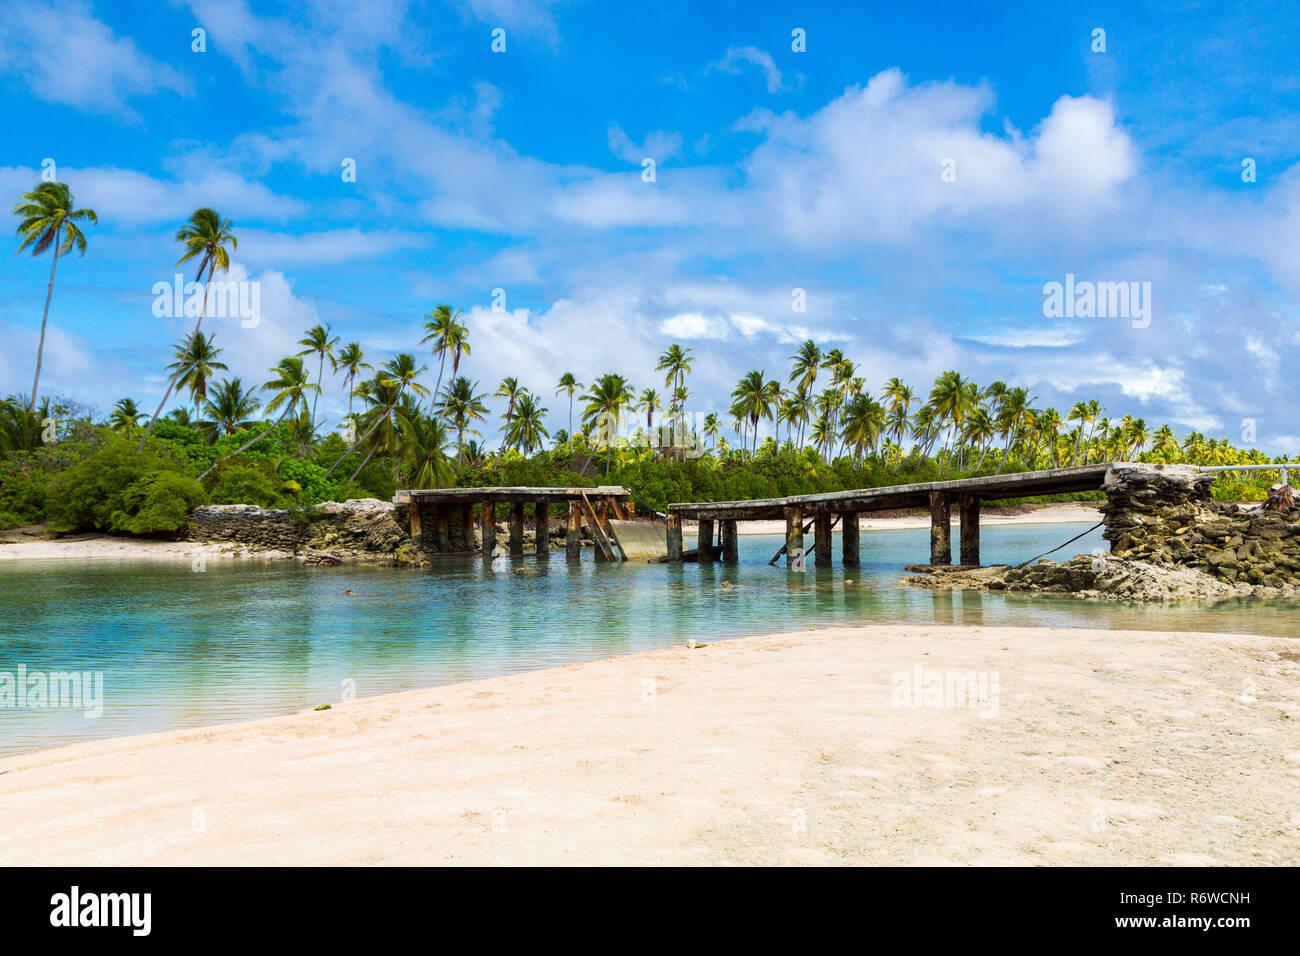 Broken bridge under palm trees between islets over lagoon, North Tarawa atoll, Kiribati, Micronesia, Gilbert islands, Oceania, South Pacific Ocean. - Stock Image